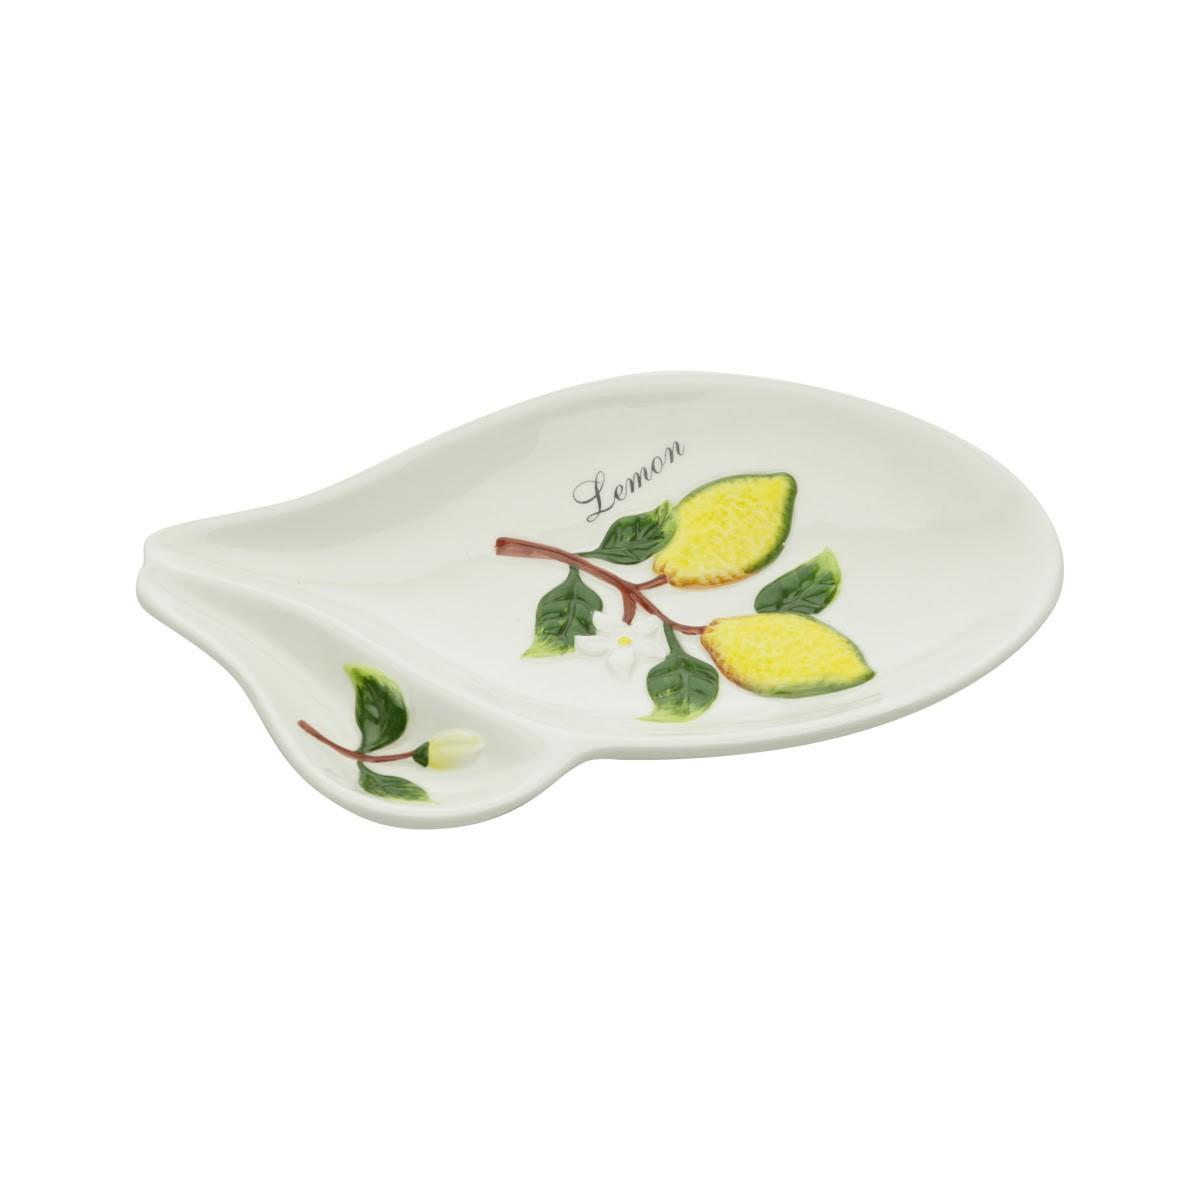 Petisqueira Cerâmica Lemons